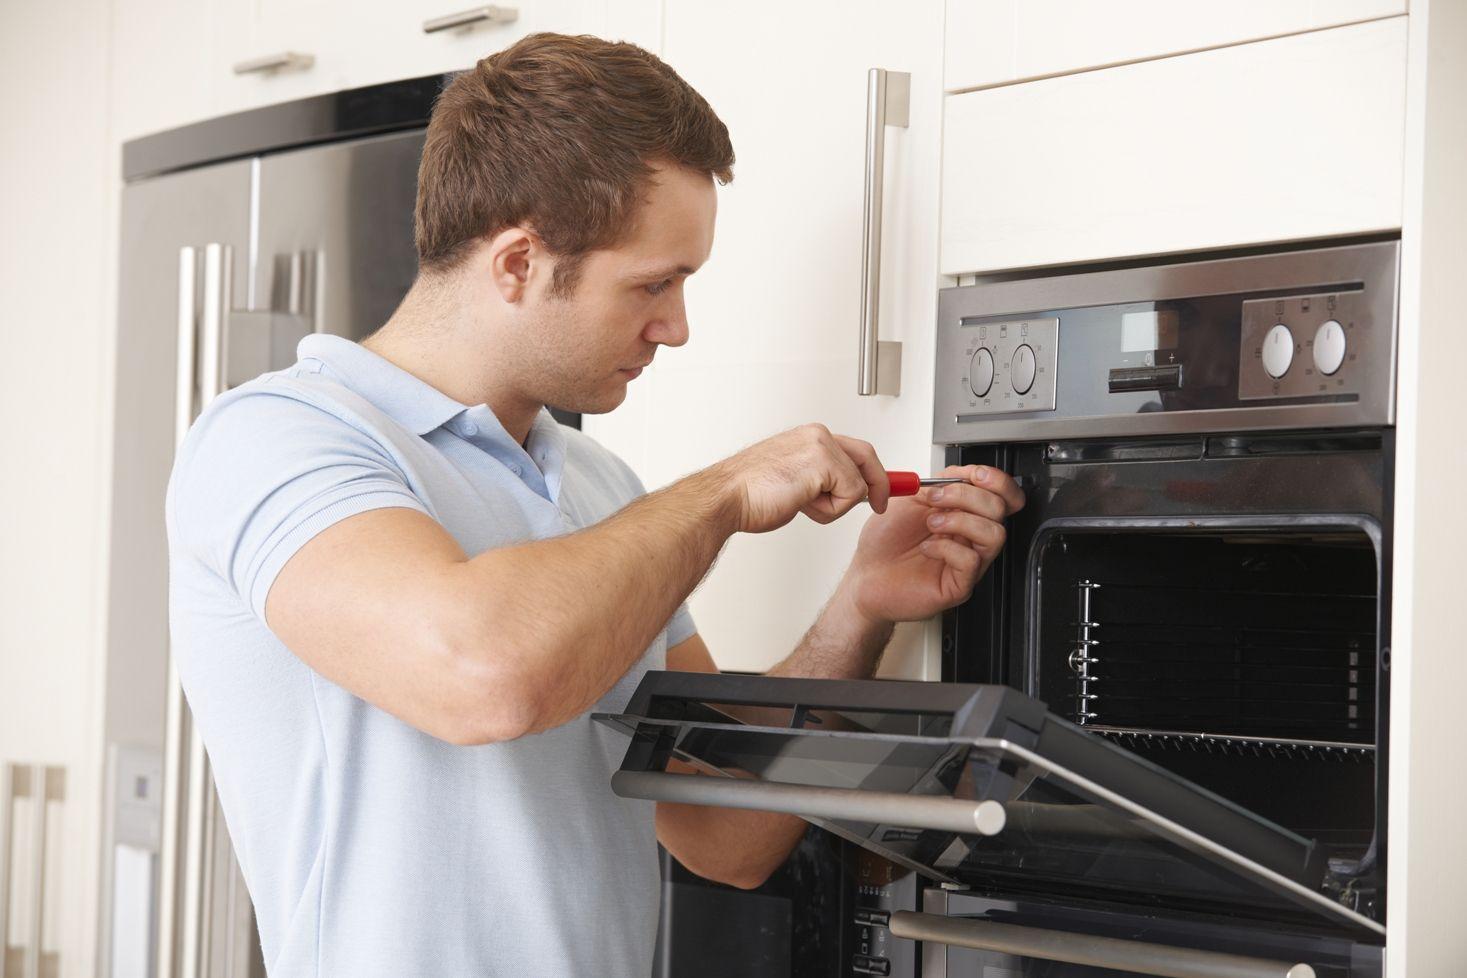 Manchester Electrician provides domestic service